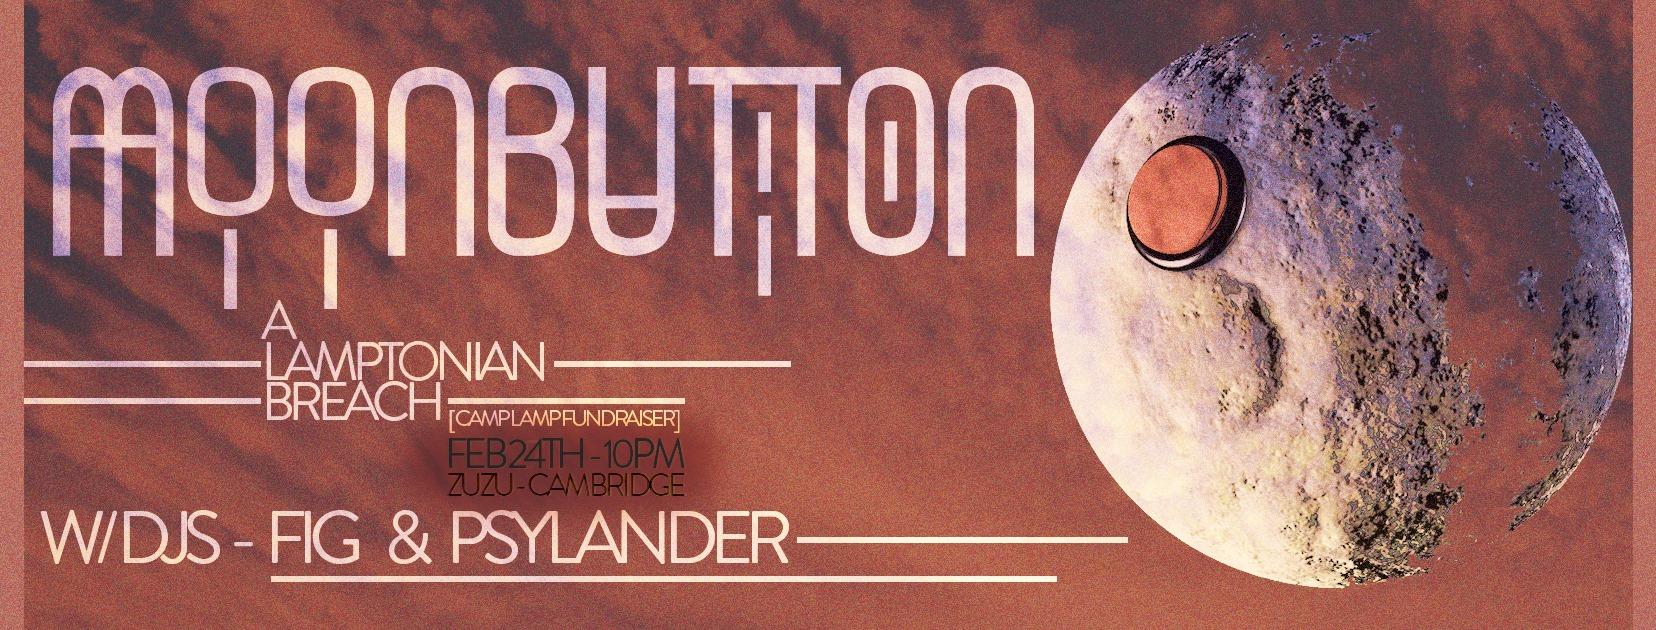 Moon Button: A Lamptonian Breach [A Camp Lamp Fundraiser]